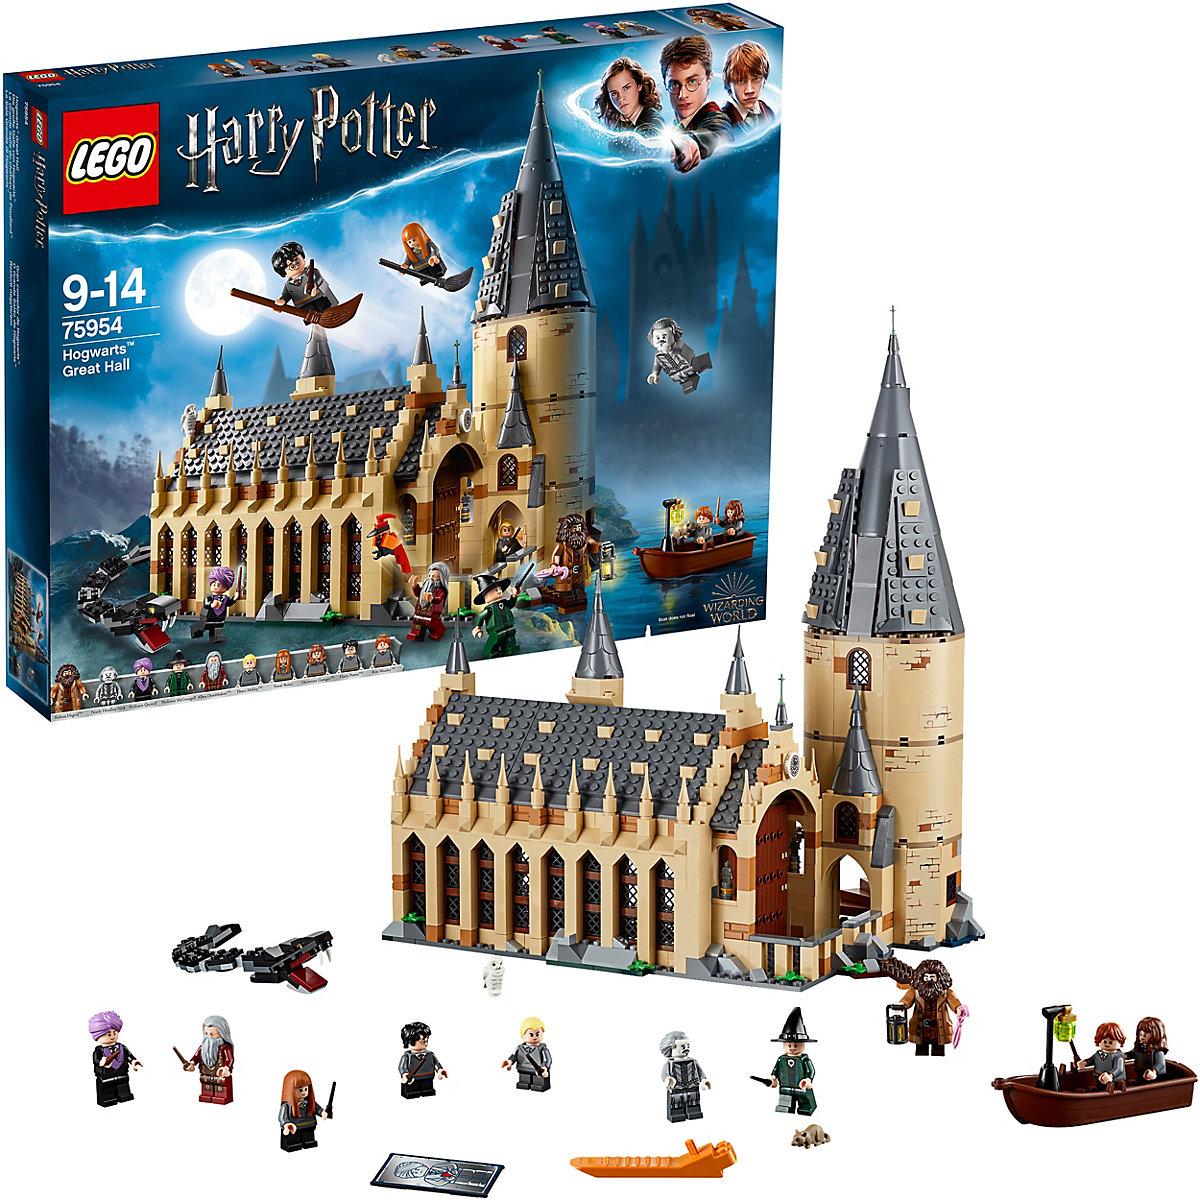 Jeu de Construction Lego Harry Potter - La Grande Salle du château de Poudlard - 75954